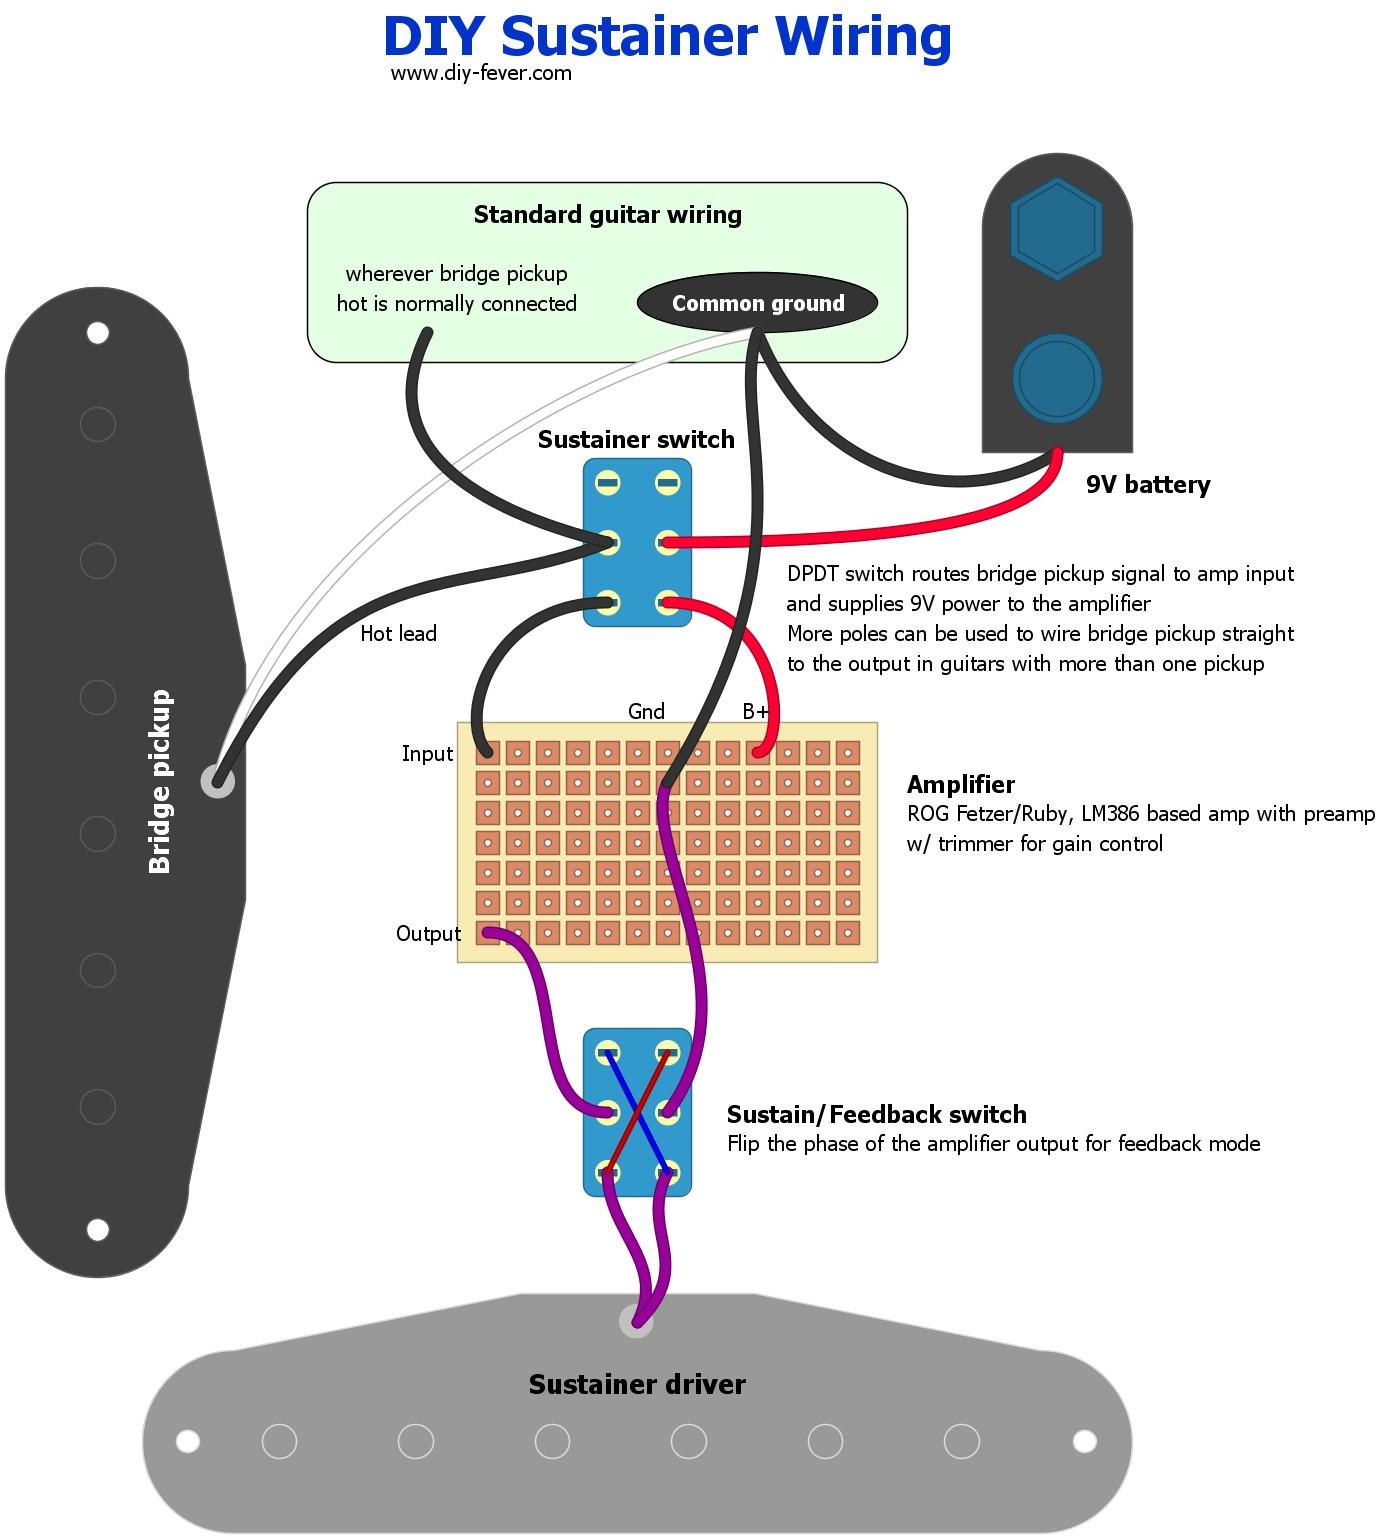 Wiring Diagram Guitar Valid Misc Diy Sustainer Diy Fever – Building My Own Guitars Amps